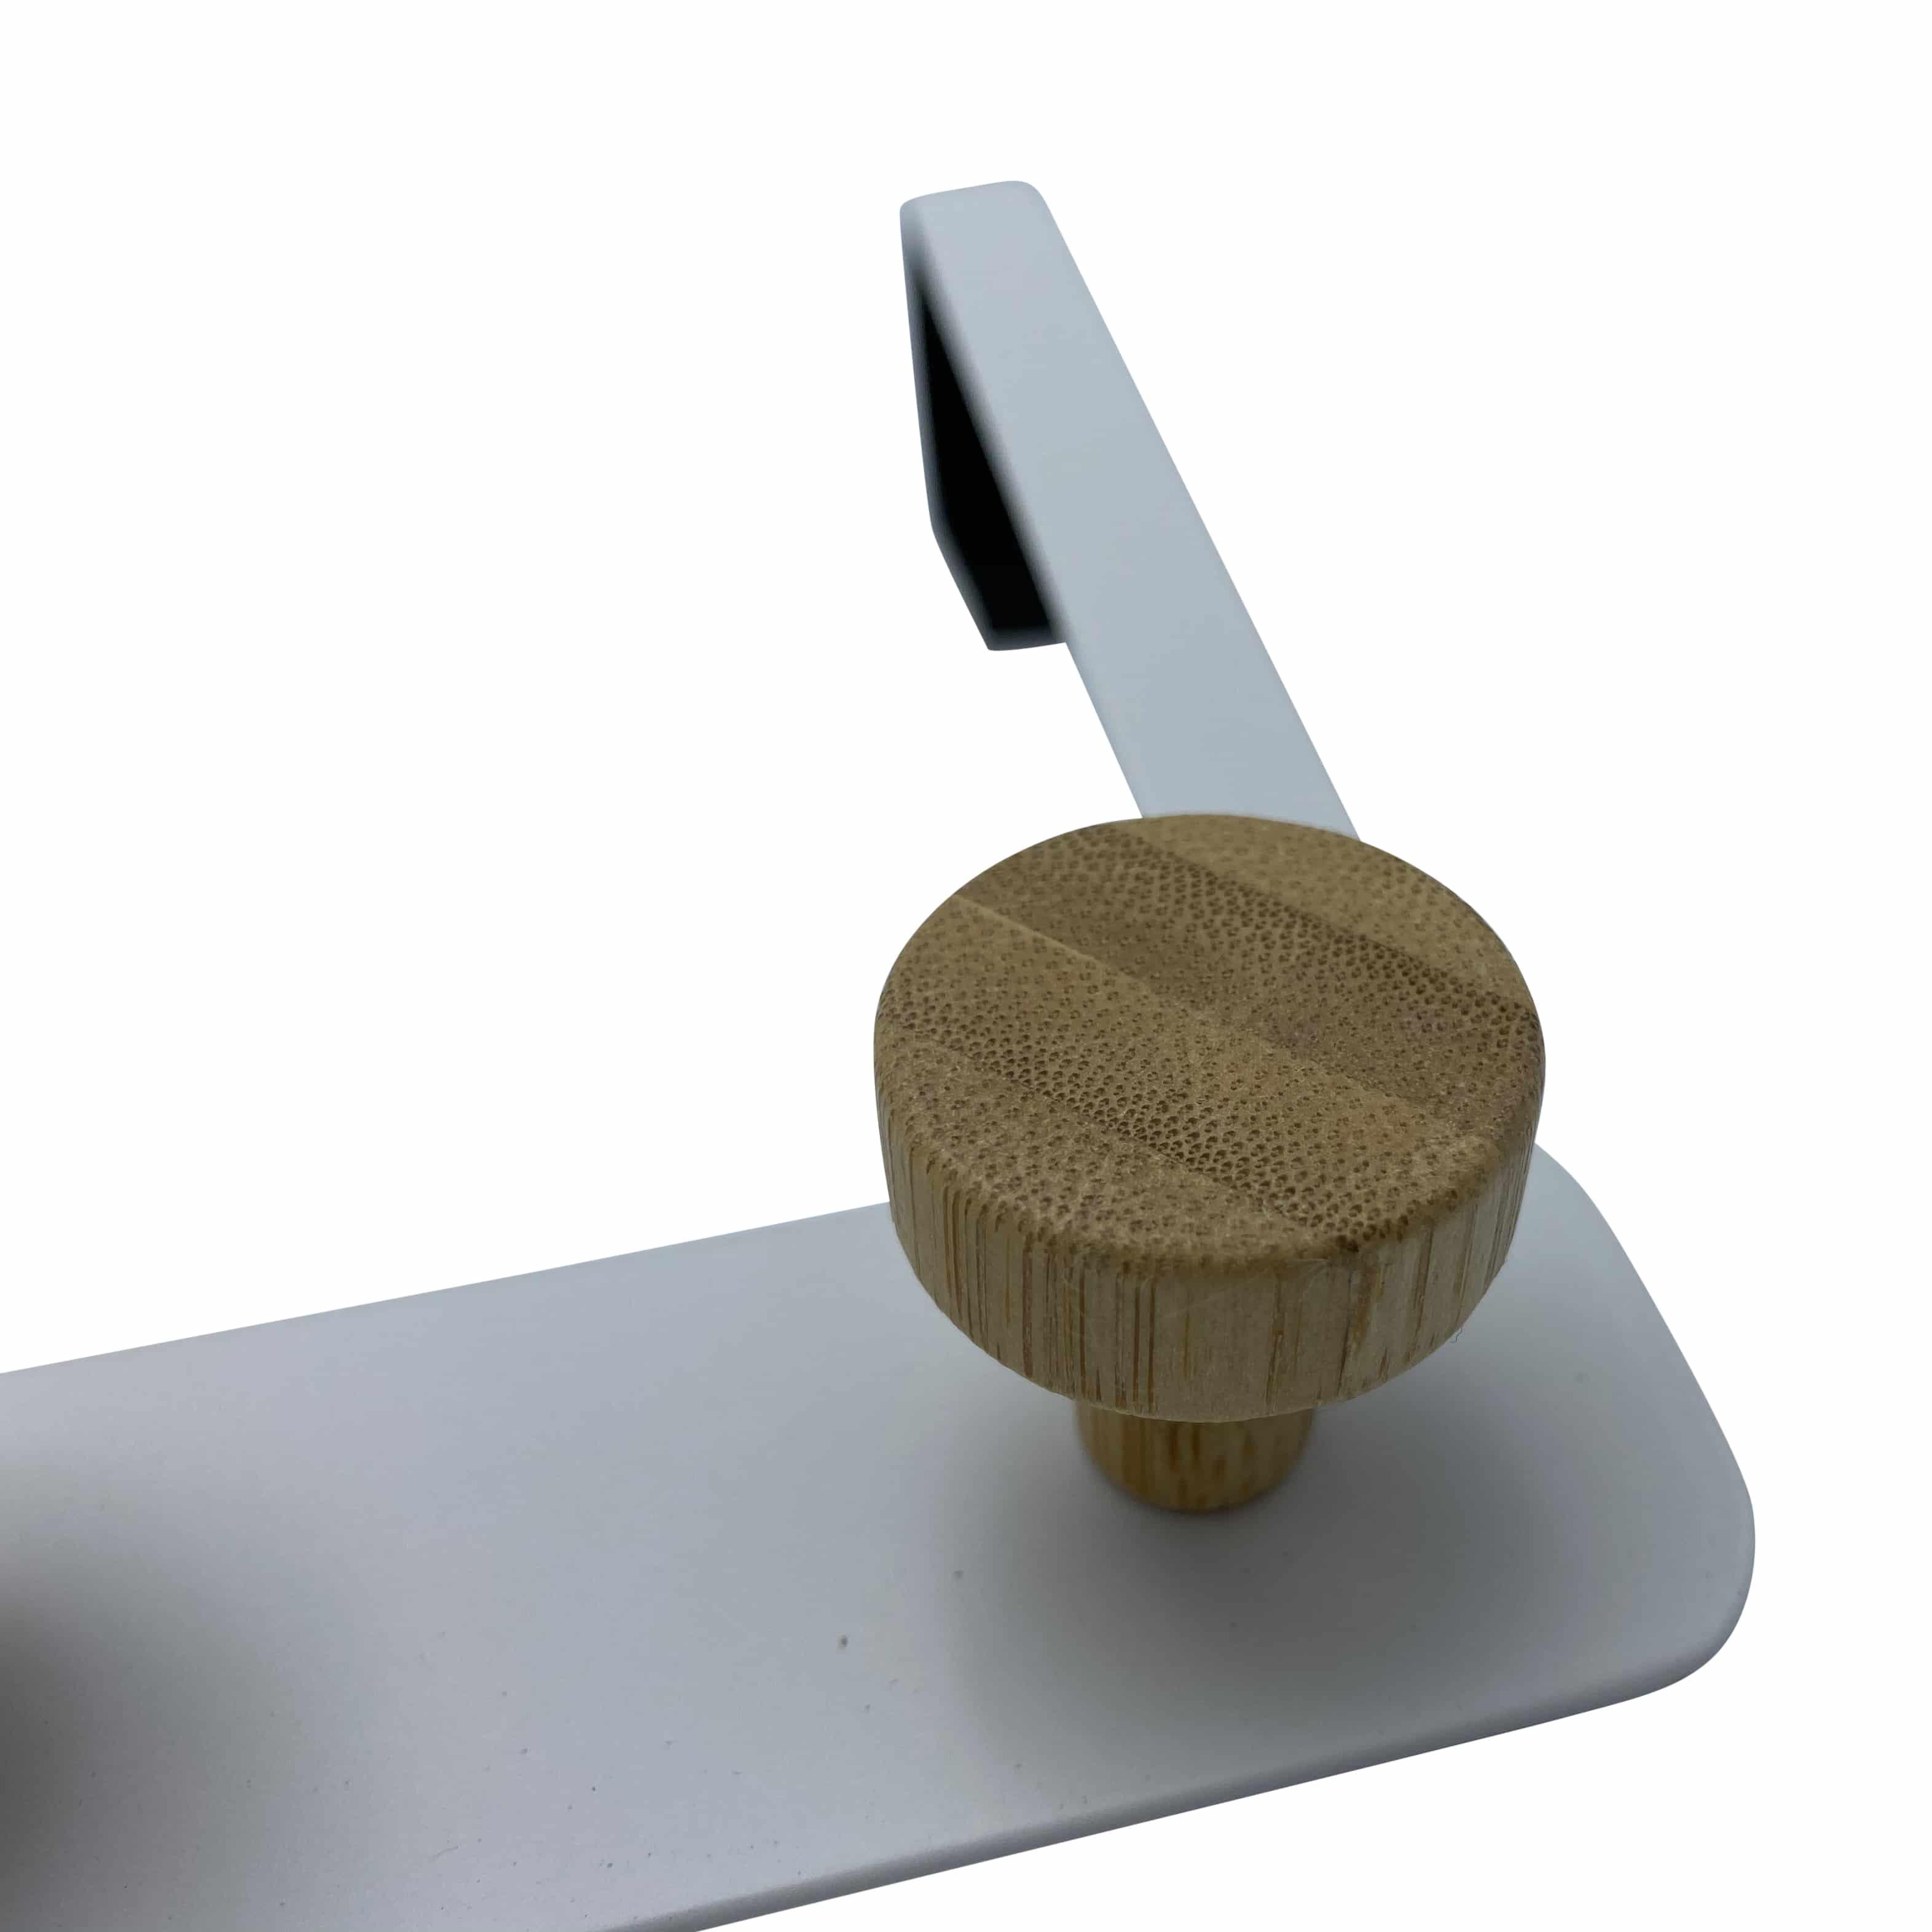 4goodz Deurkapstok Metaal met bamboe knoppen - 33x5x20cm - Wit